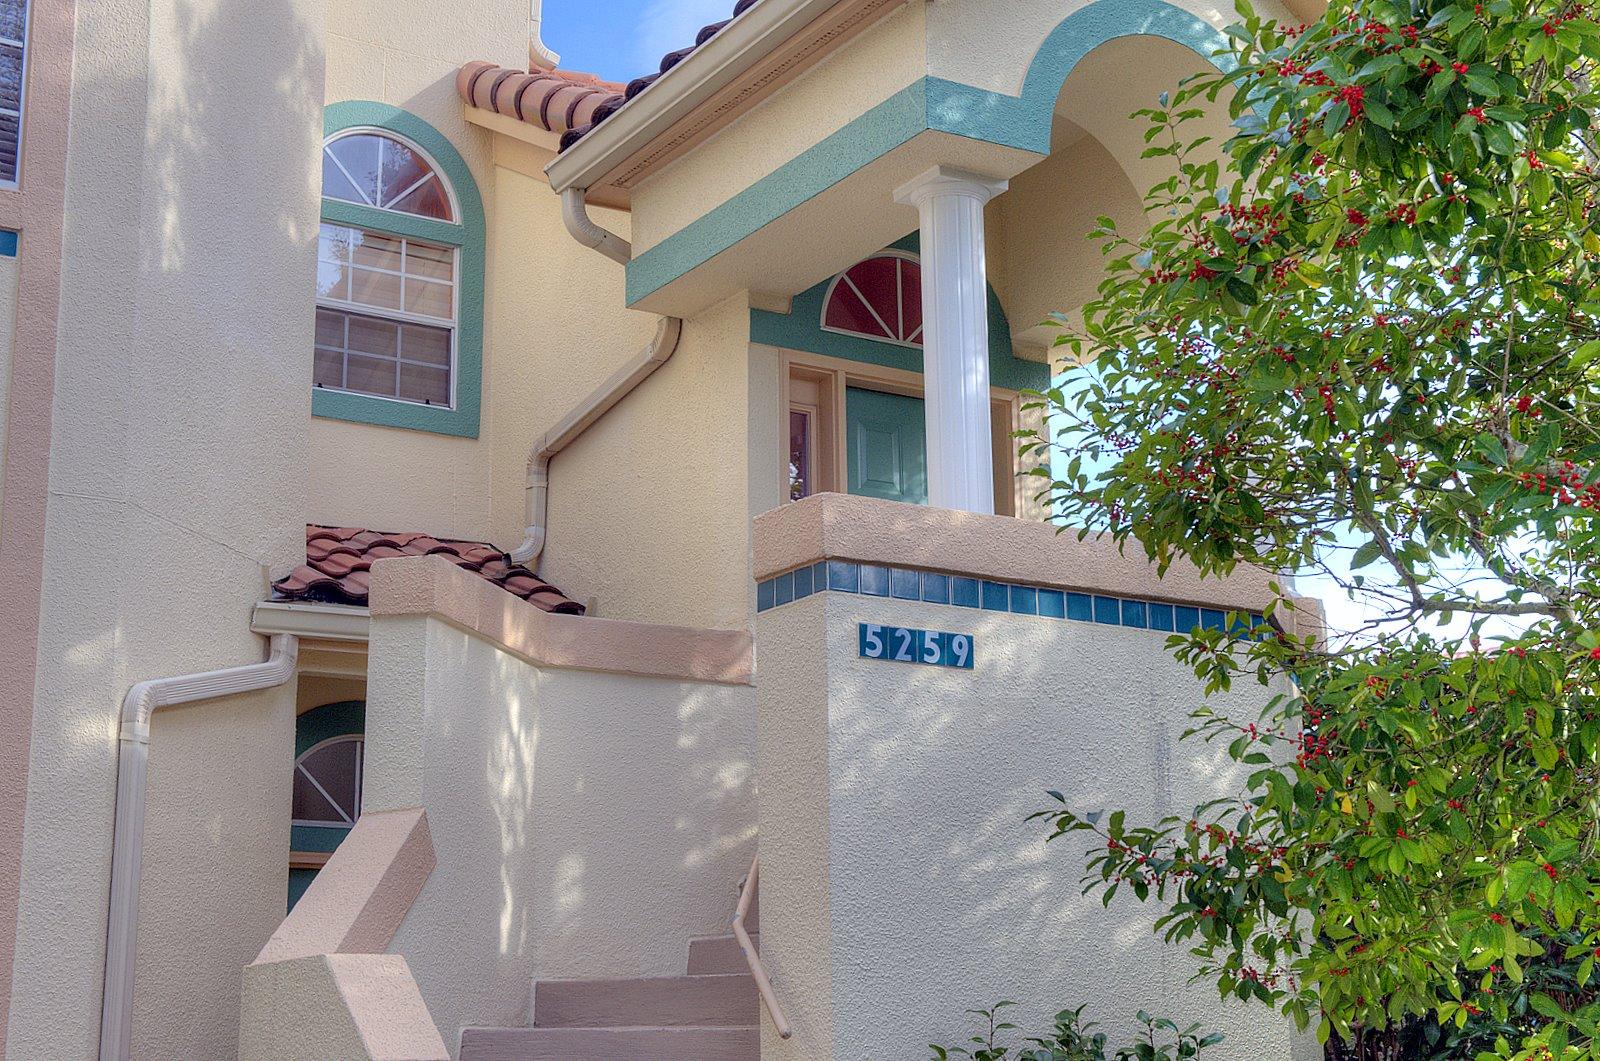 5259 Tivoli by the Sea Condo rental in Sandestin Rentals ~ Cottages and Villas  in Destin Florida - #1